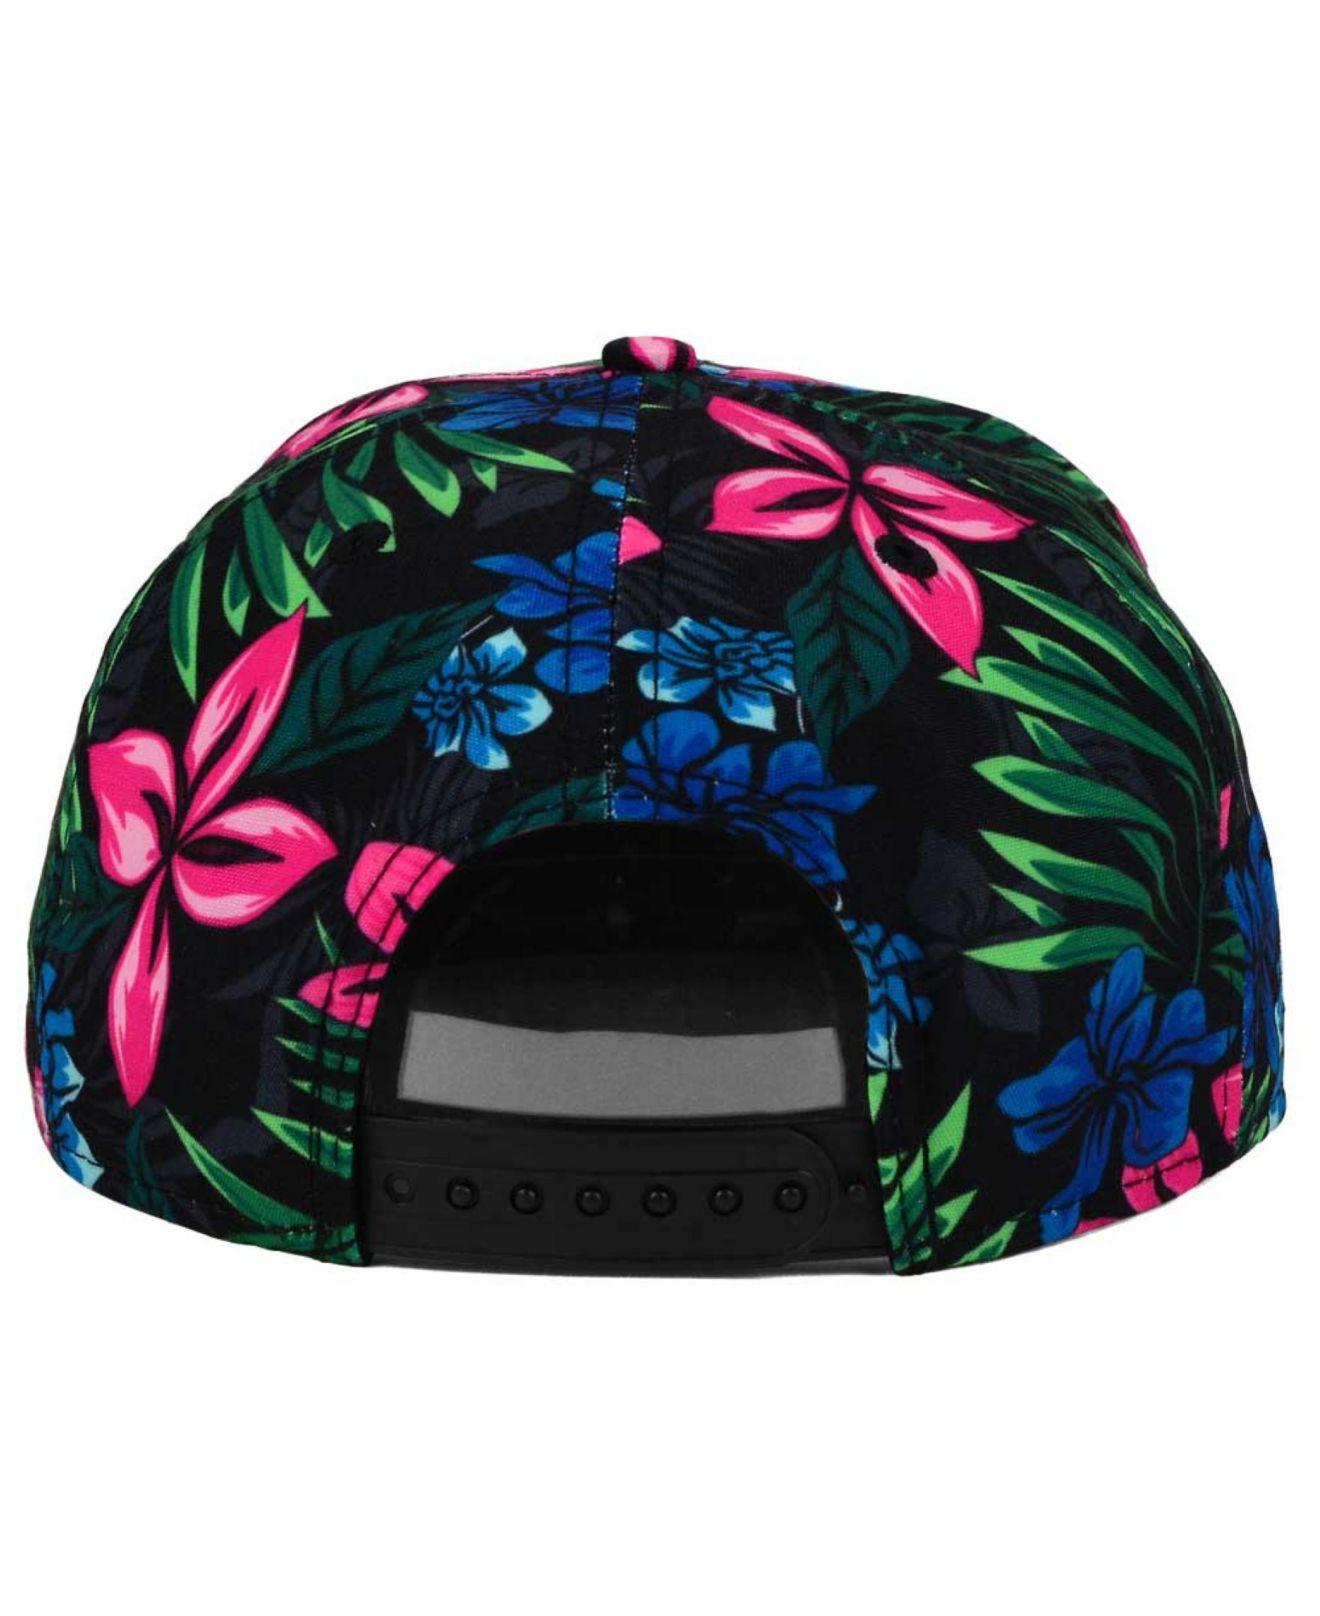 quality design 4dbc4 a6efb ... reduced lyst ktz new york knicks shadow floral 9fifty snapback cap in  00868 303f6